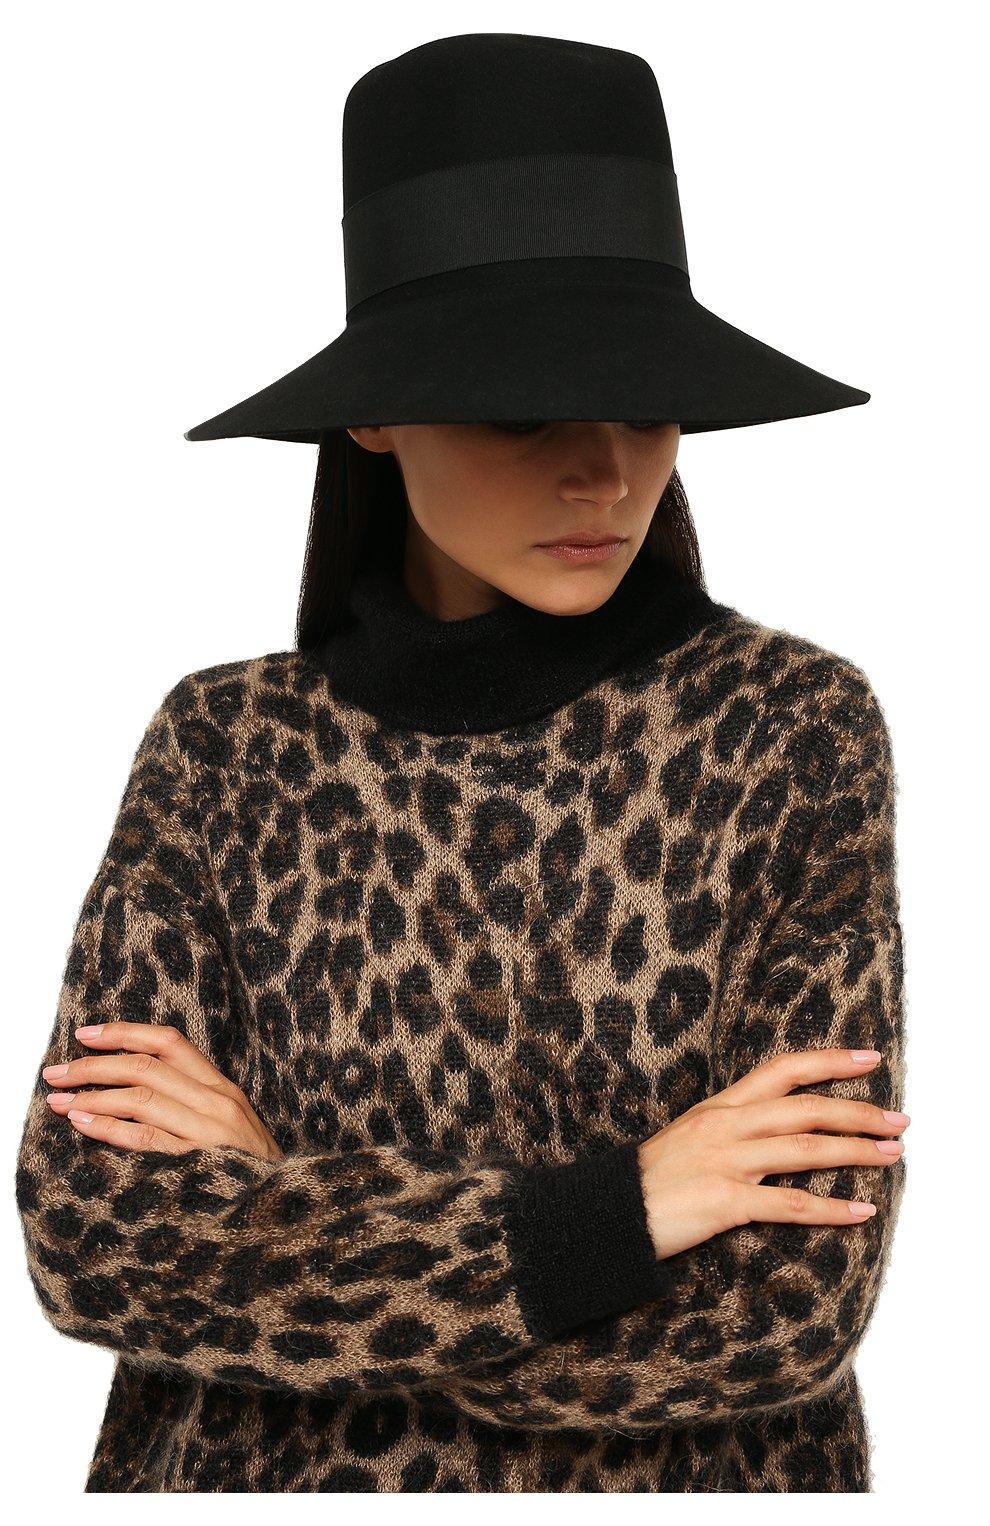 a14e32d98a40 Фетровая шляпа с лентой